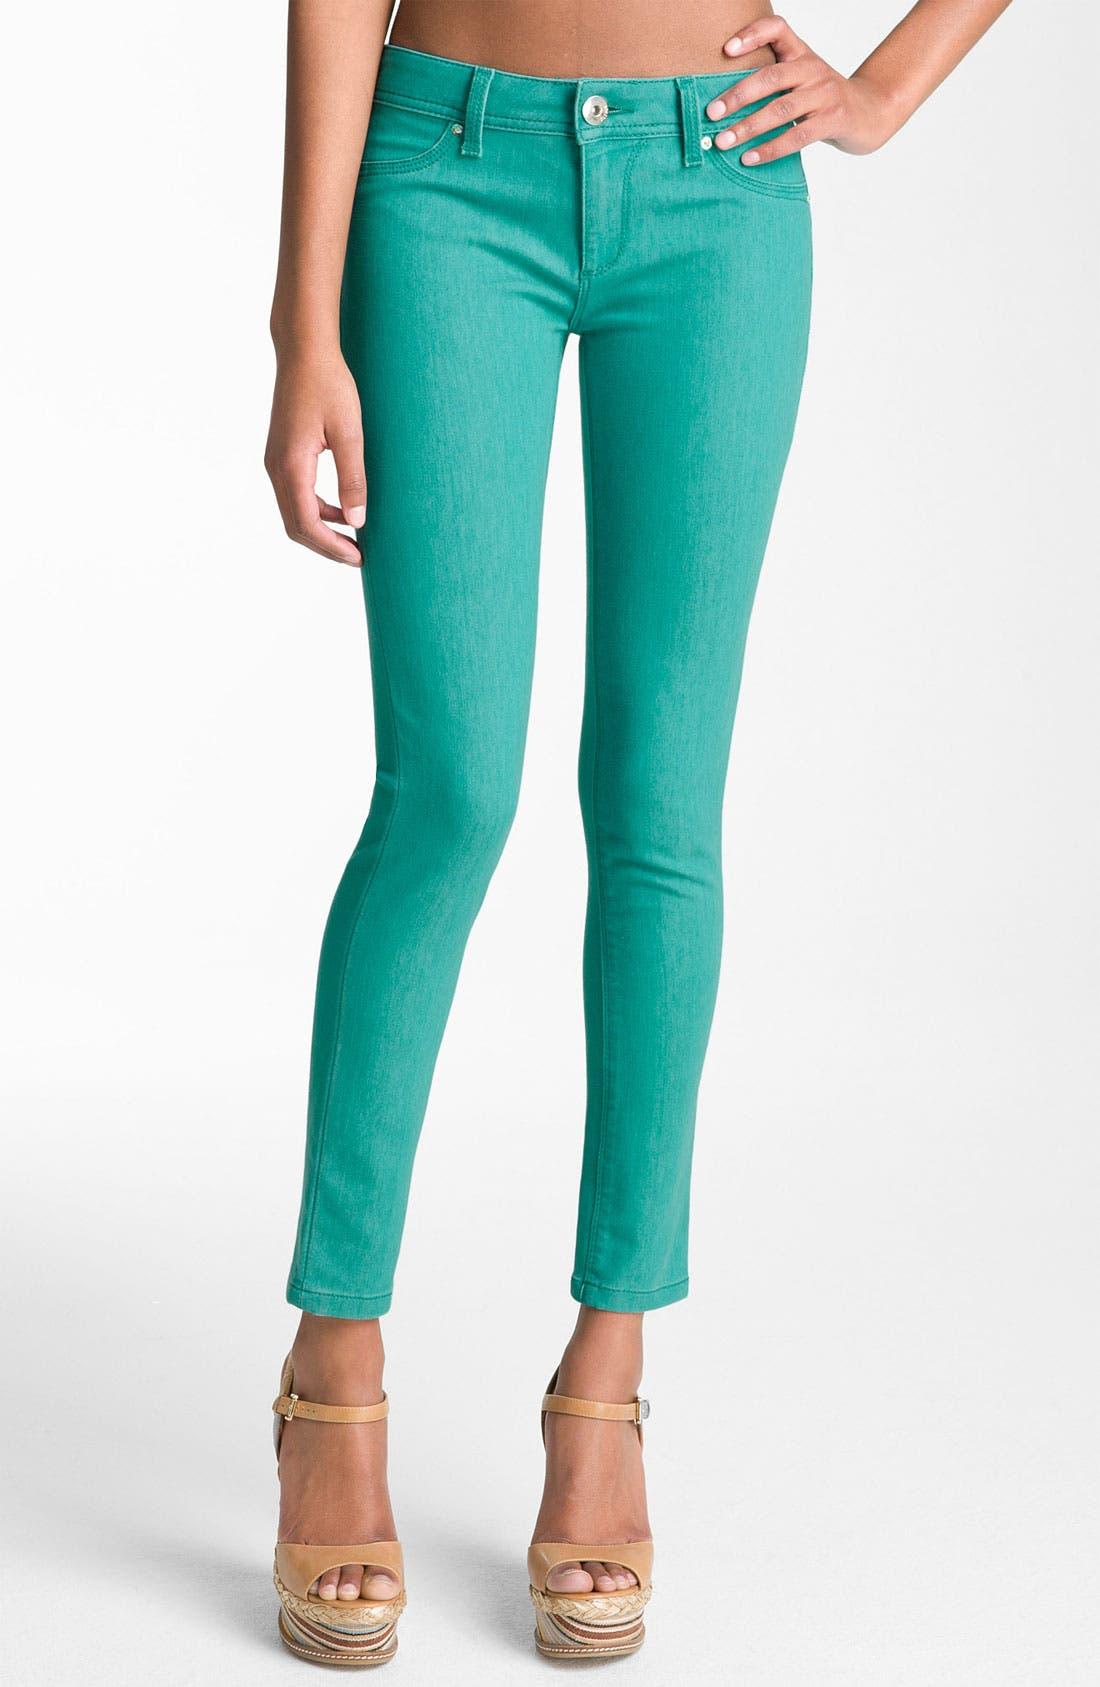 Alternate Image 1 Selected - DL1961 'Emma' Skinny Jeans (Seaglass)